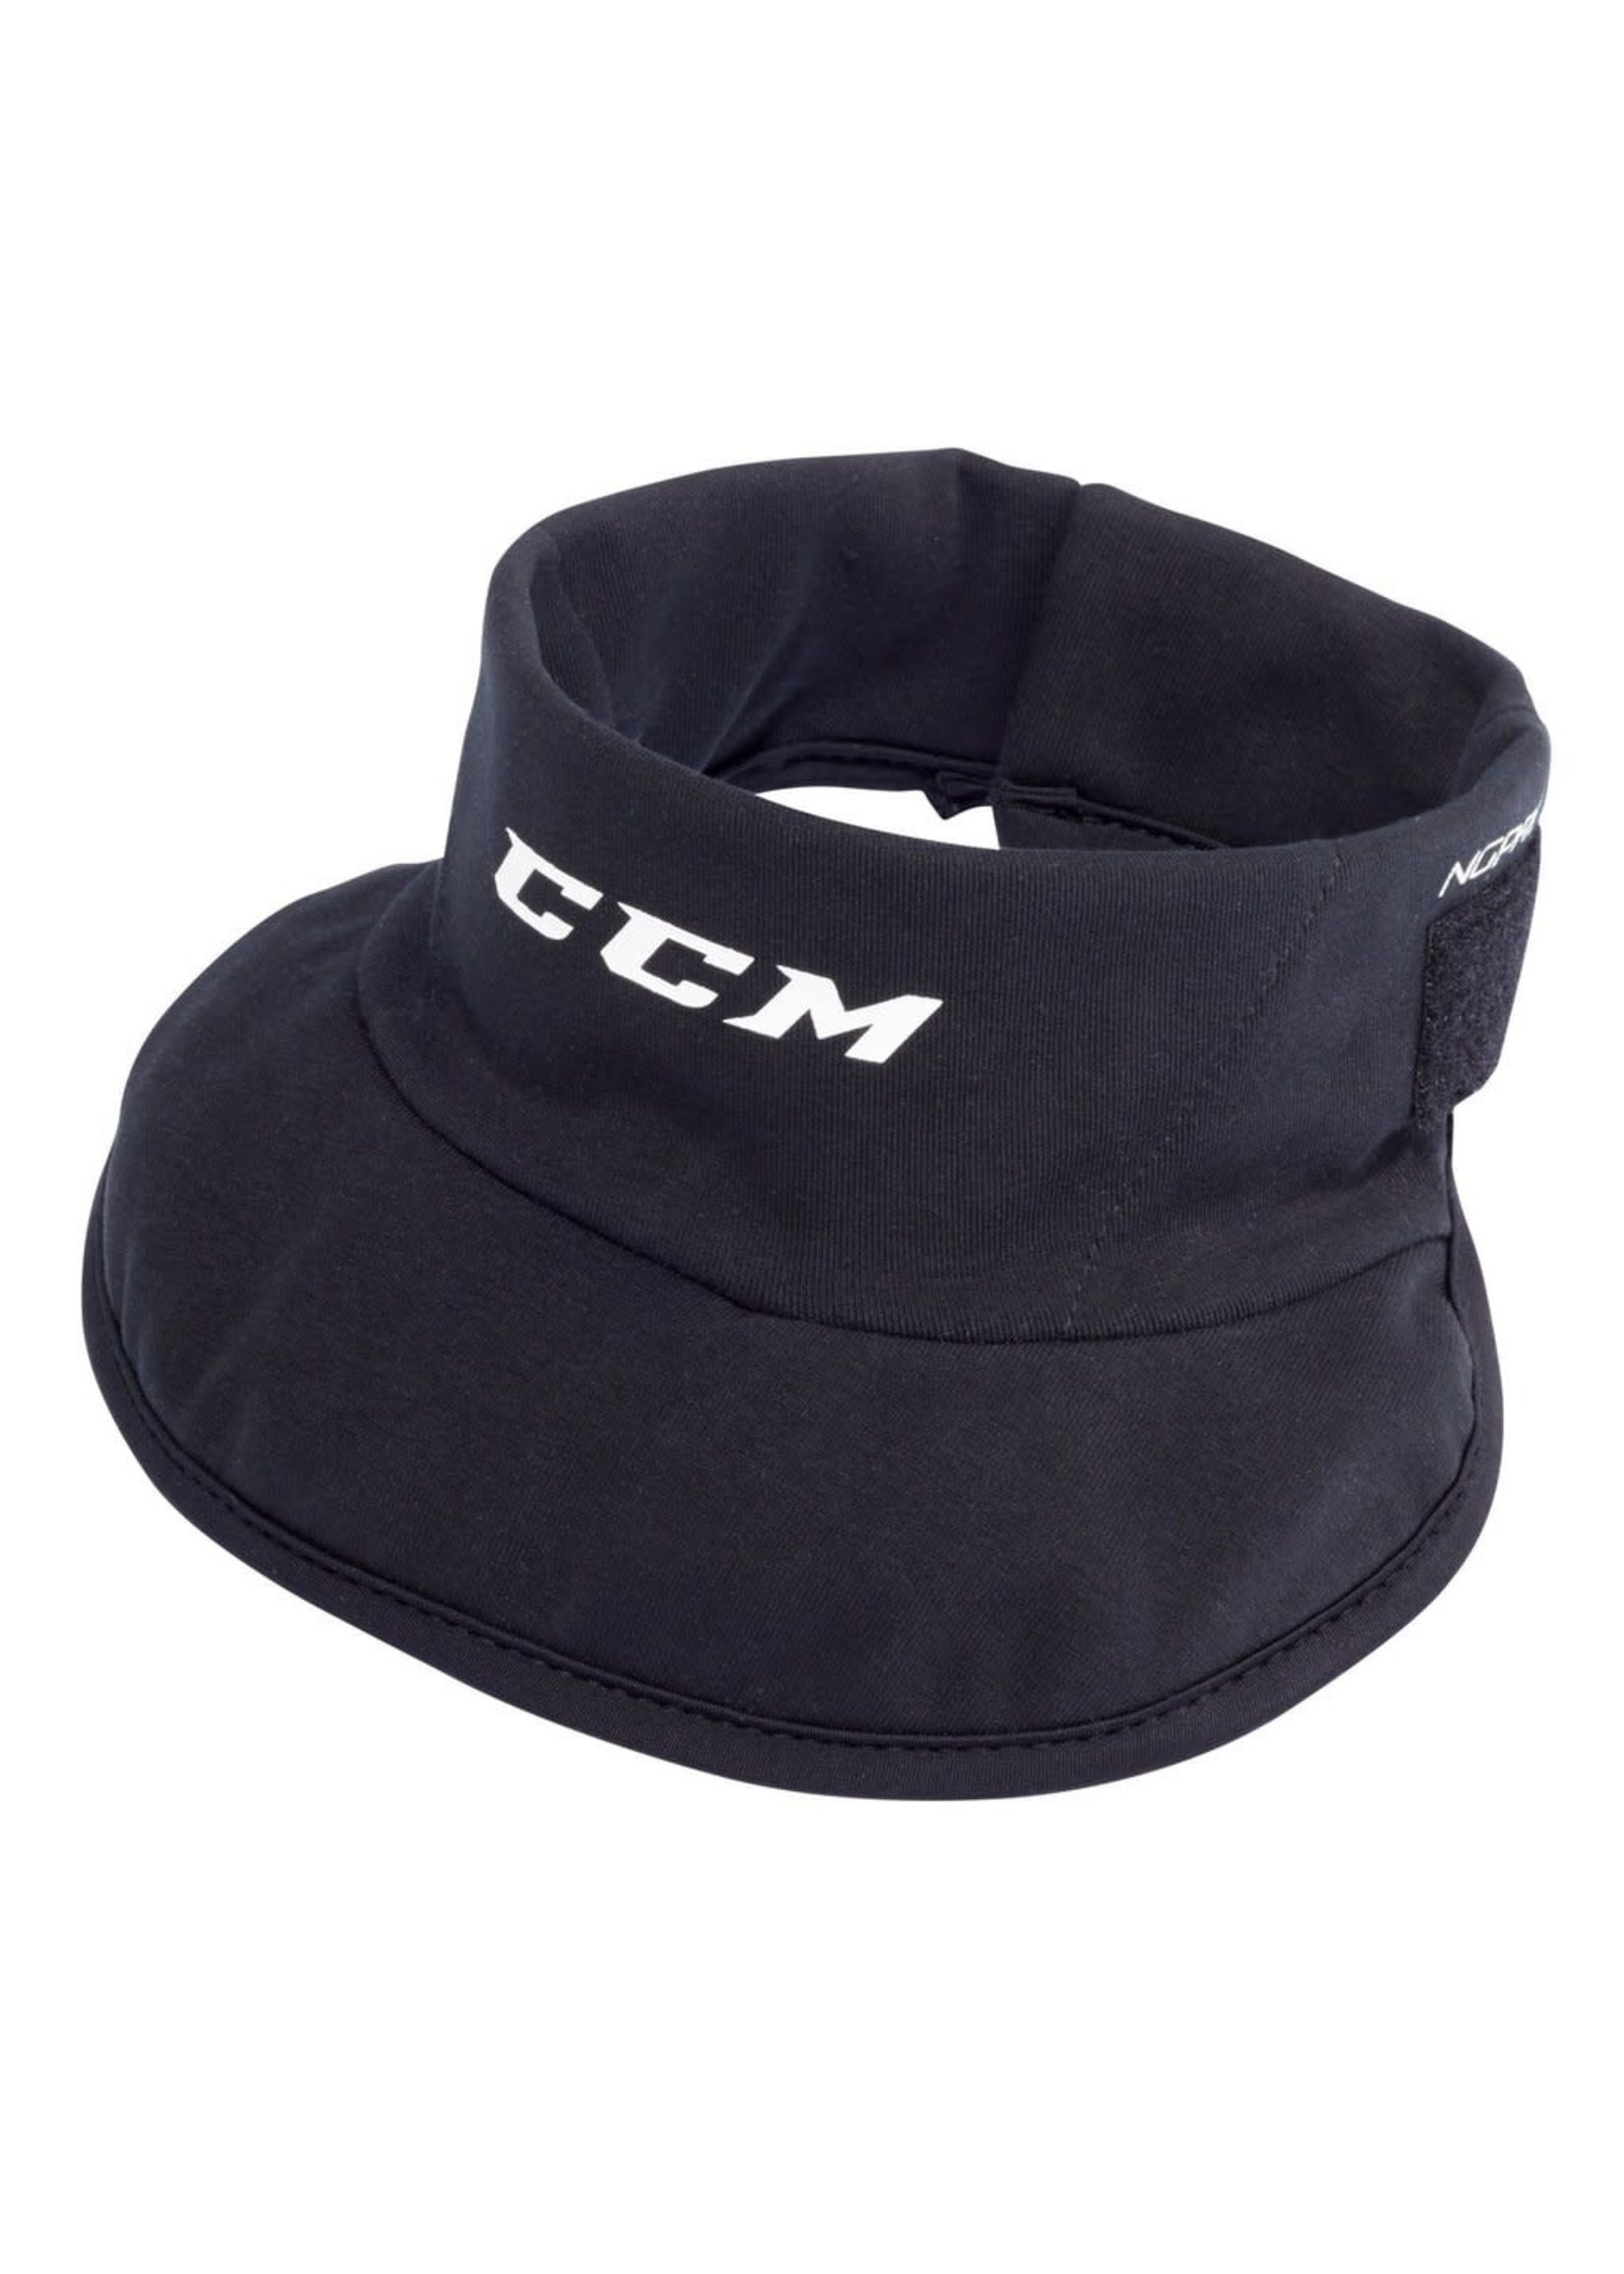 CCM Hockey CCM NGPRO JR NECK GUARD